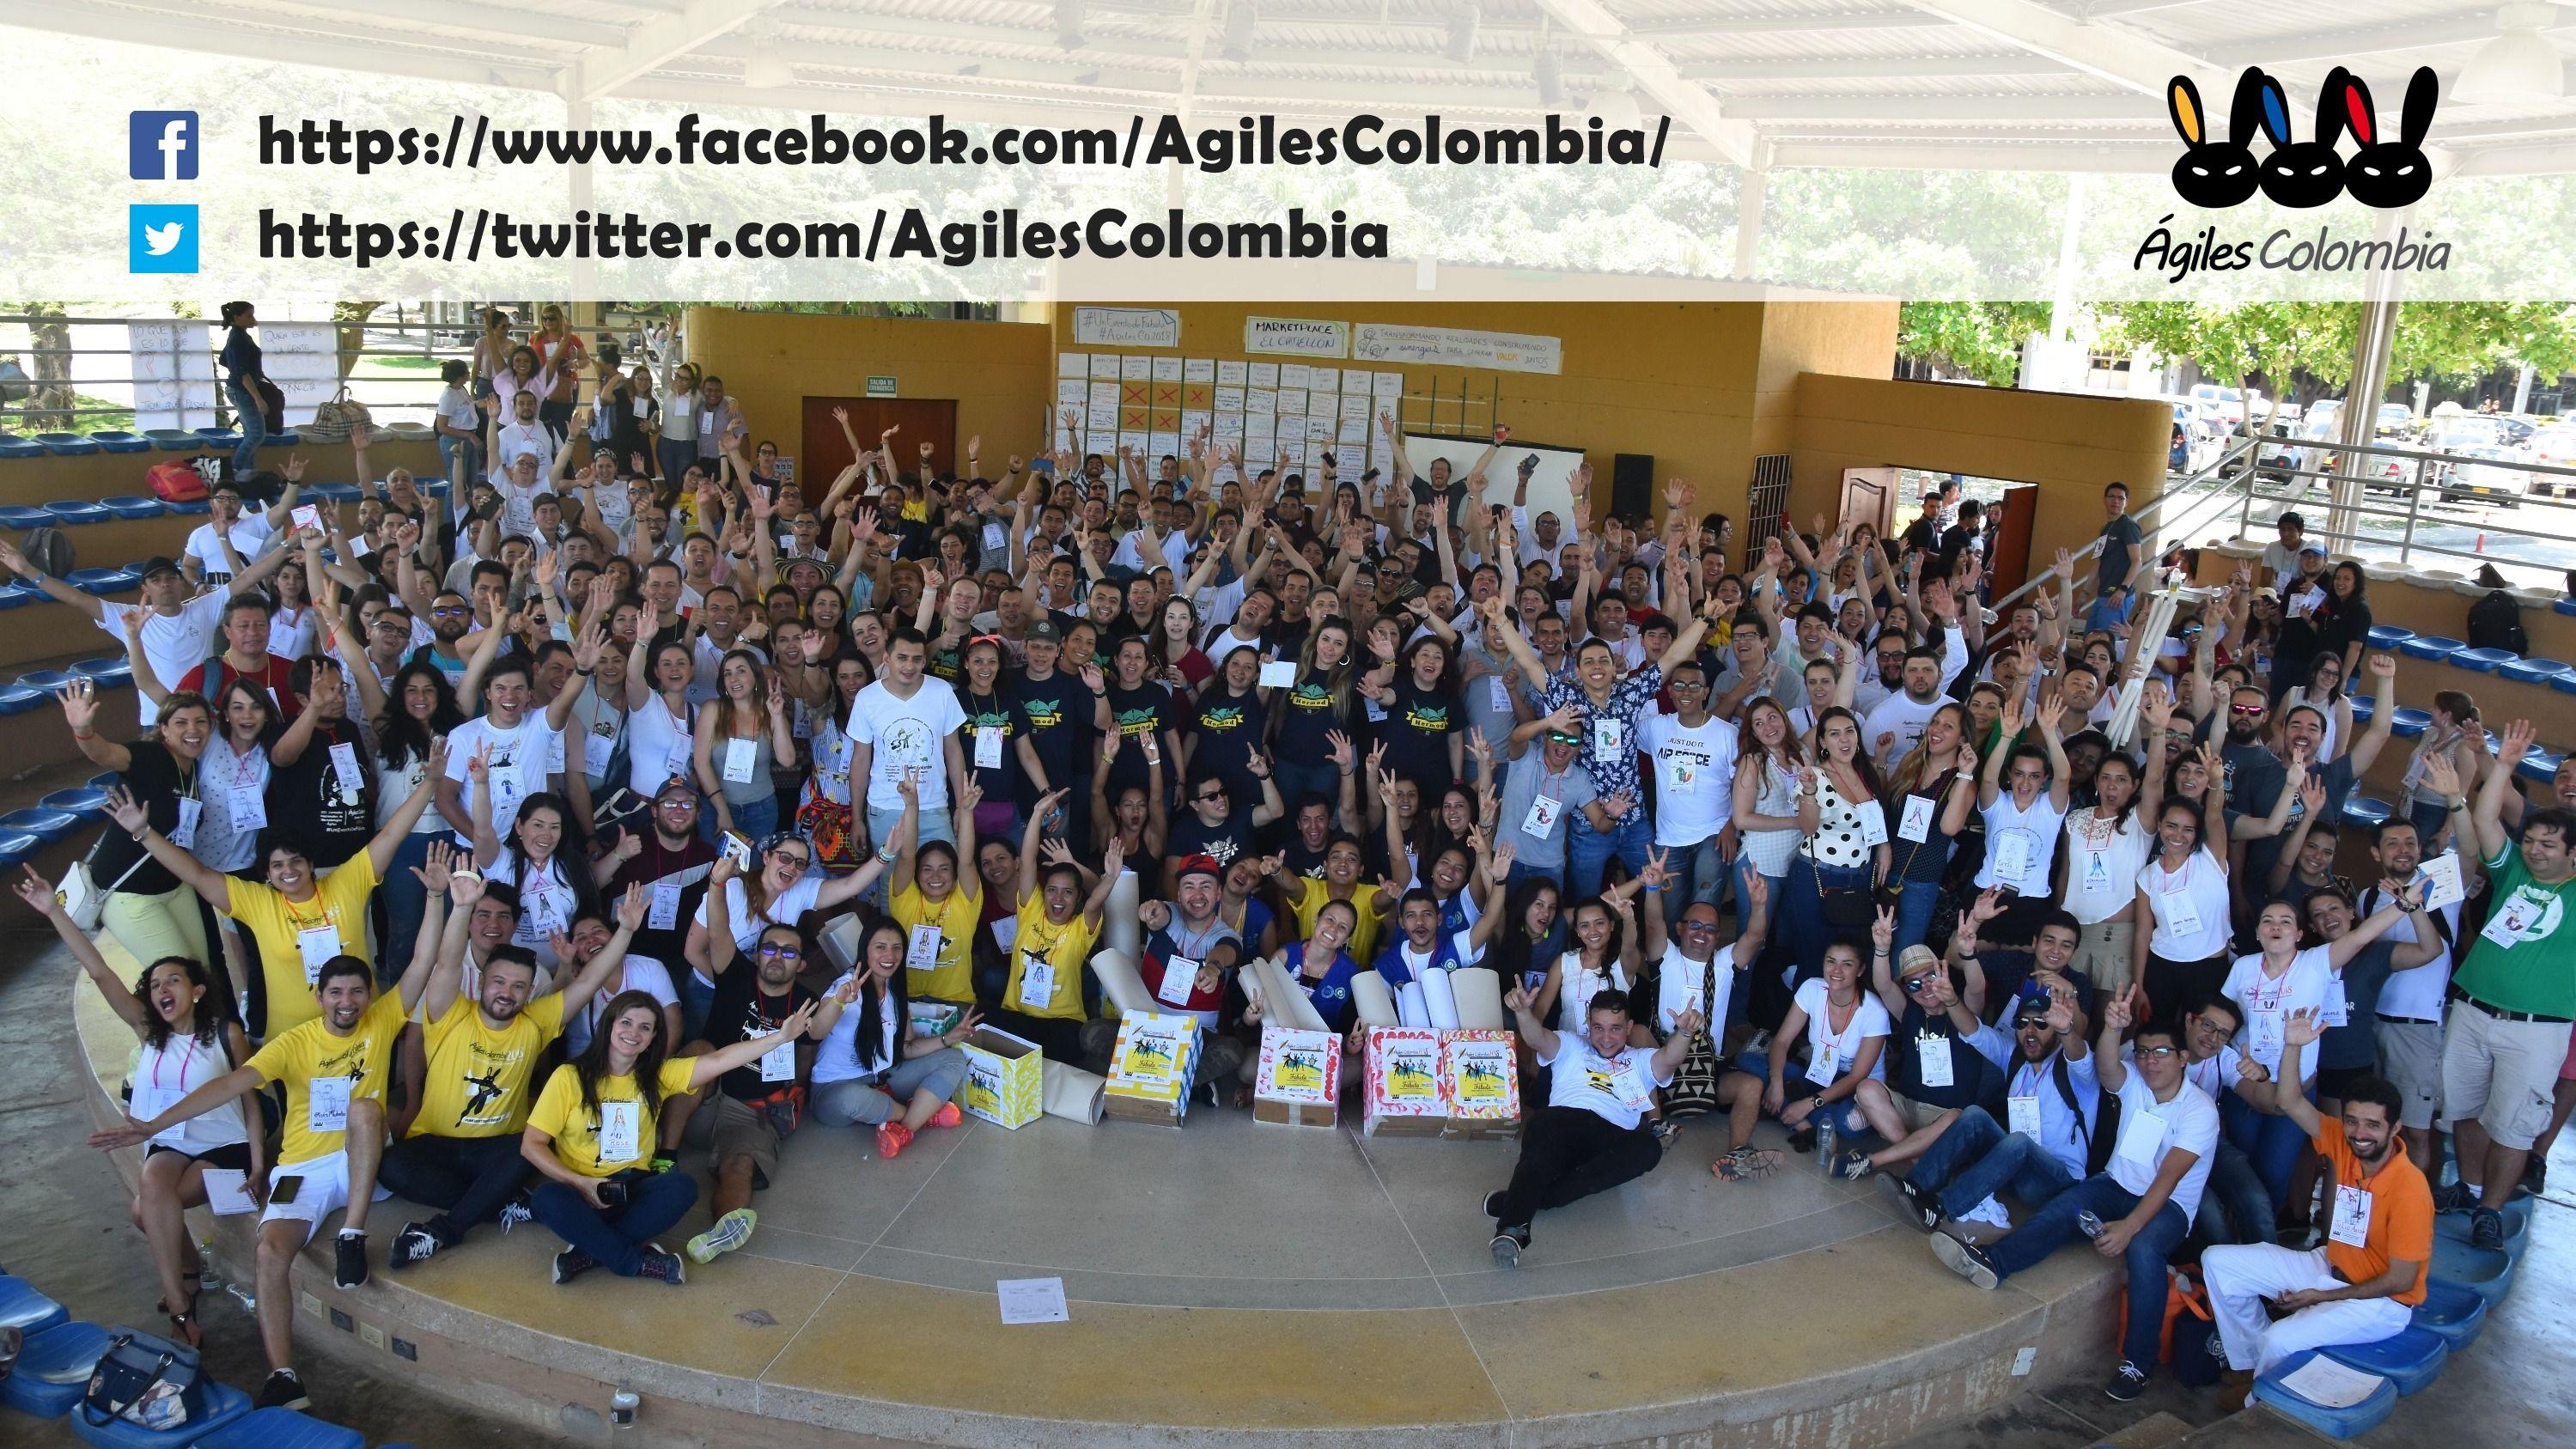 Agiles Colombia